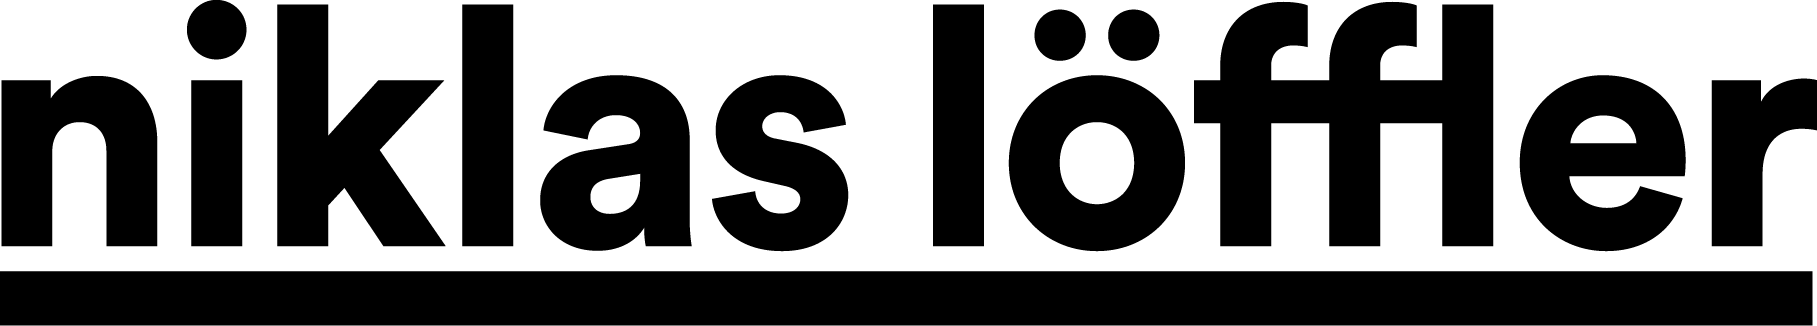 loeffler_logo_black